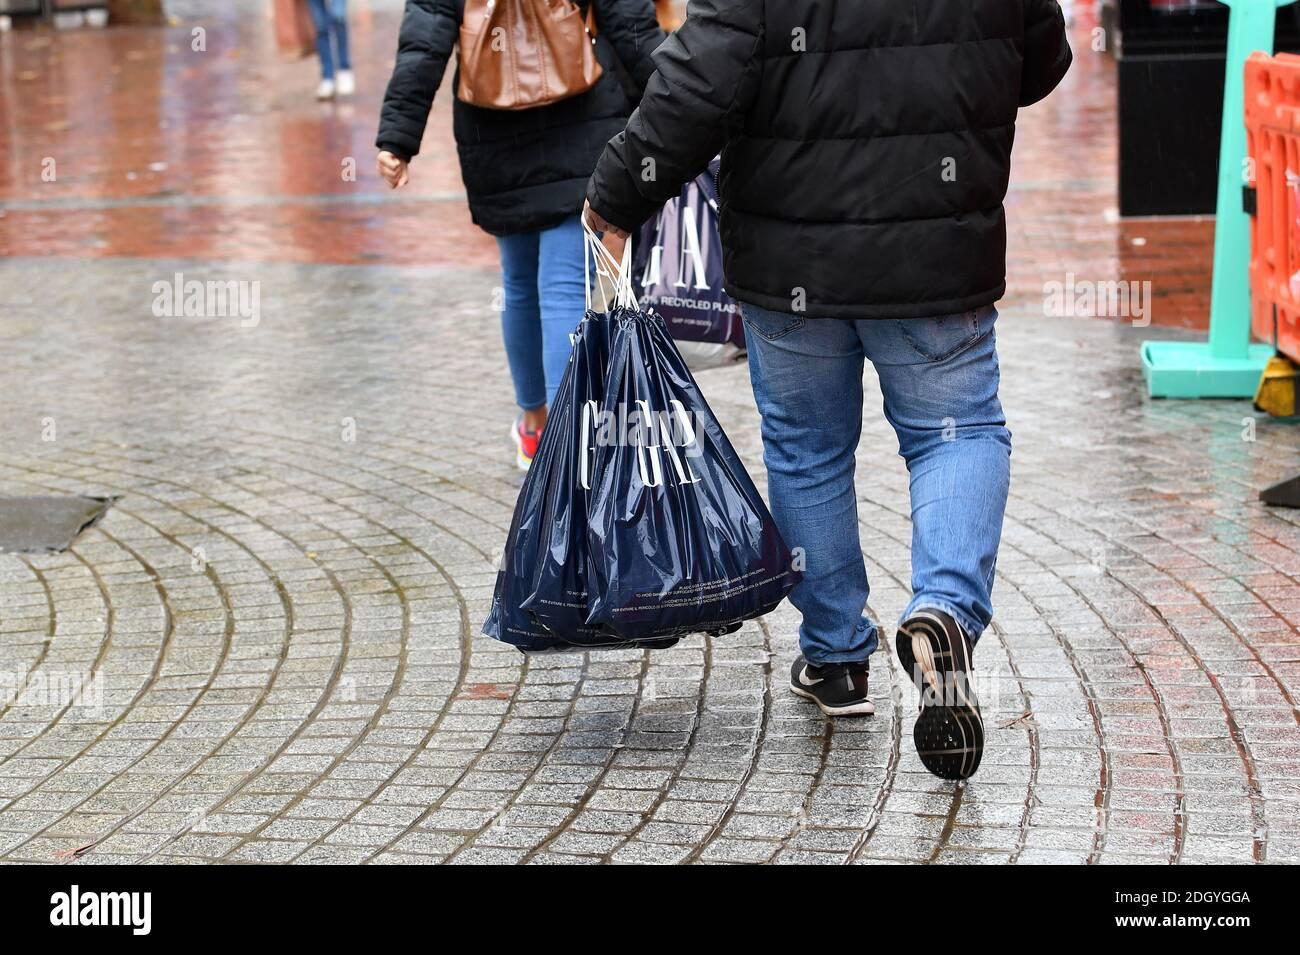 Szenen um Broad Street, Reading, Berkshire, der Tag nach Lockdown 2 endet, Donnerstag 3. Dezember 2020. Stockfoto